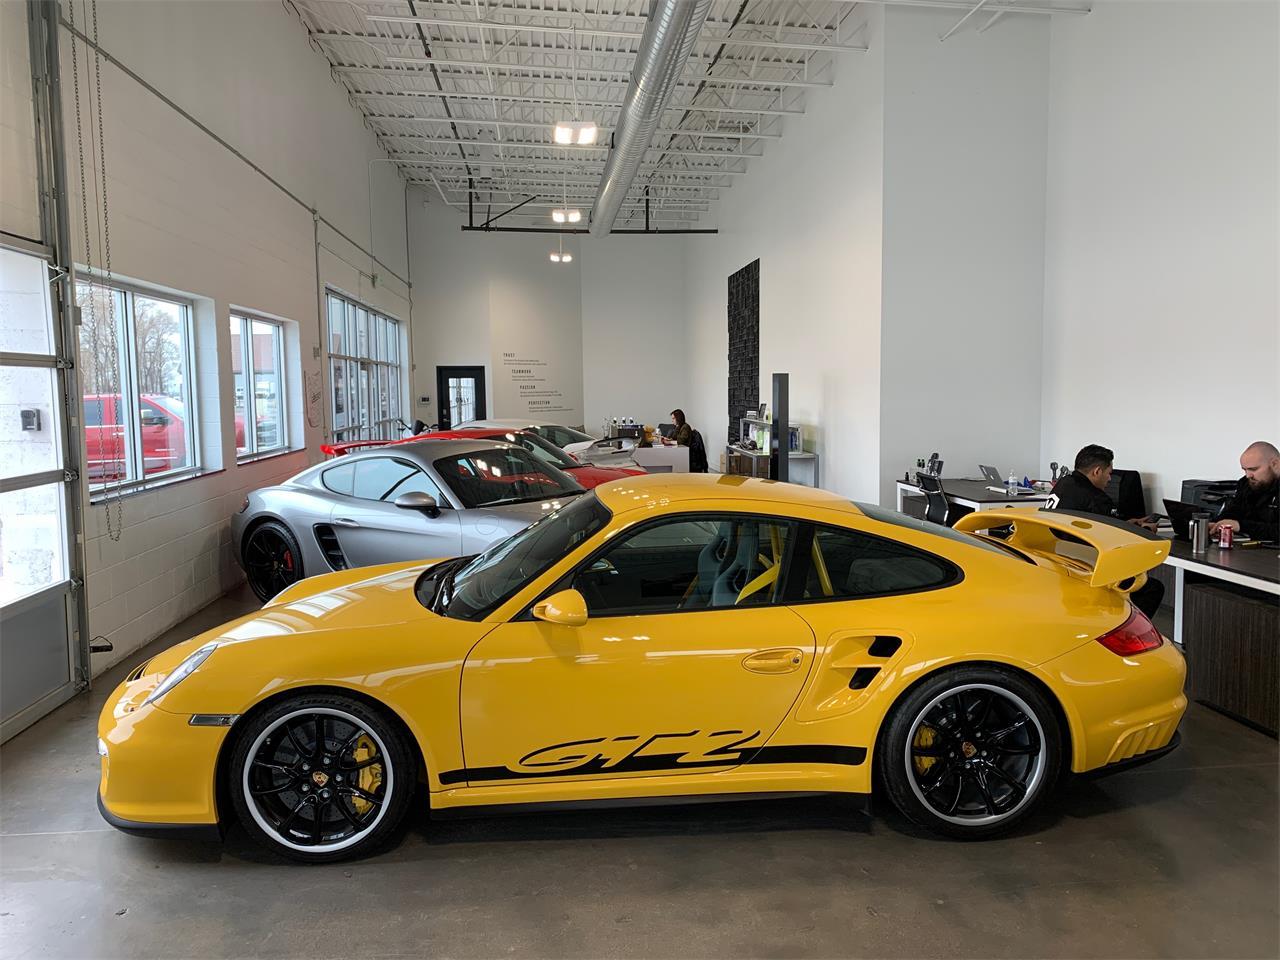 2008 Porsche GT2 (CC-1323010) for sale in SLC, Utah